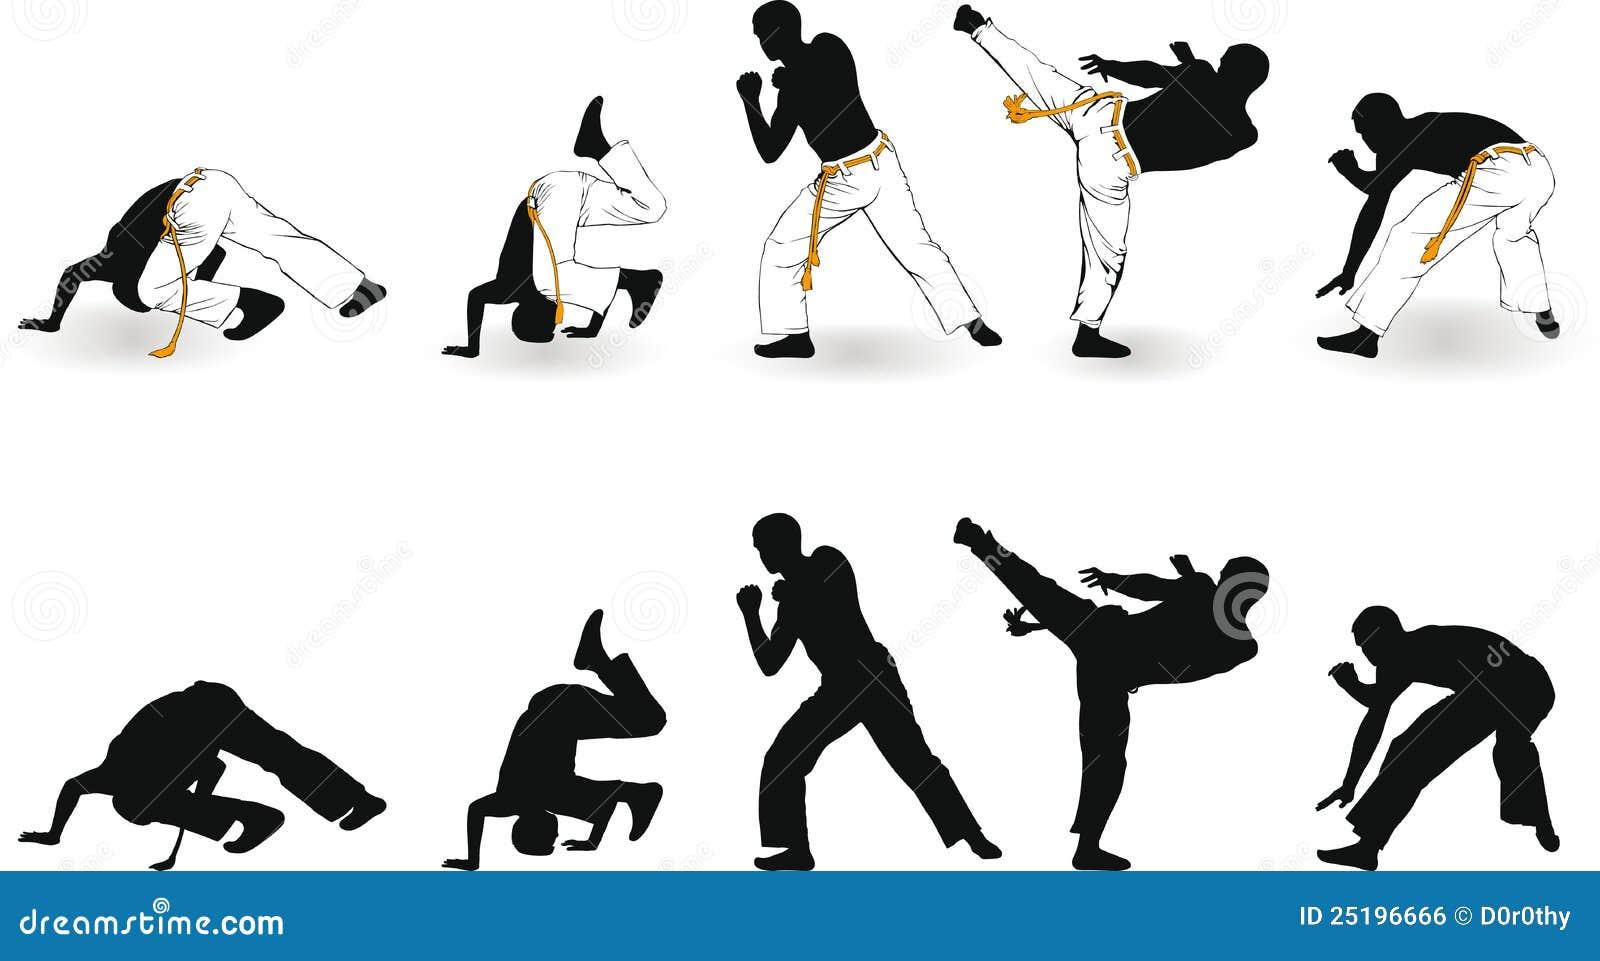 Capoeira Royalty Free Stock Image - Image: 25196666